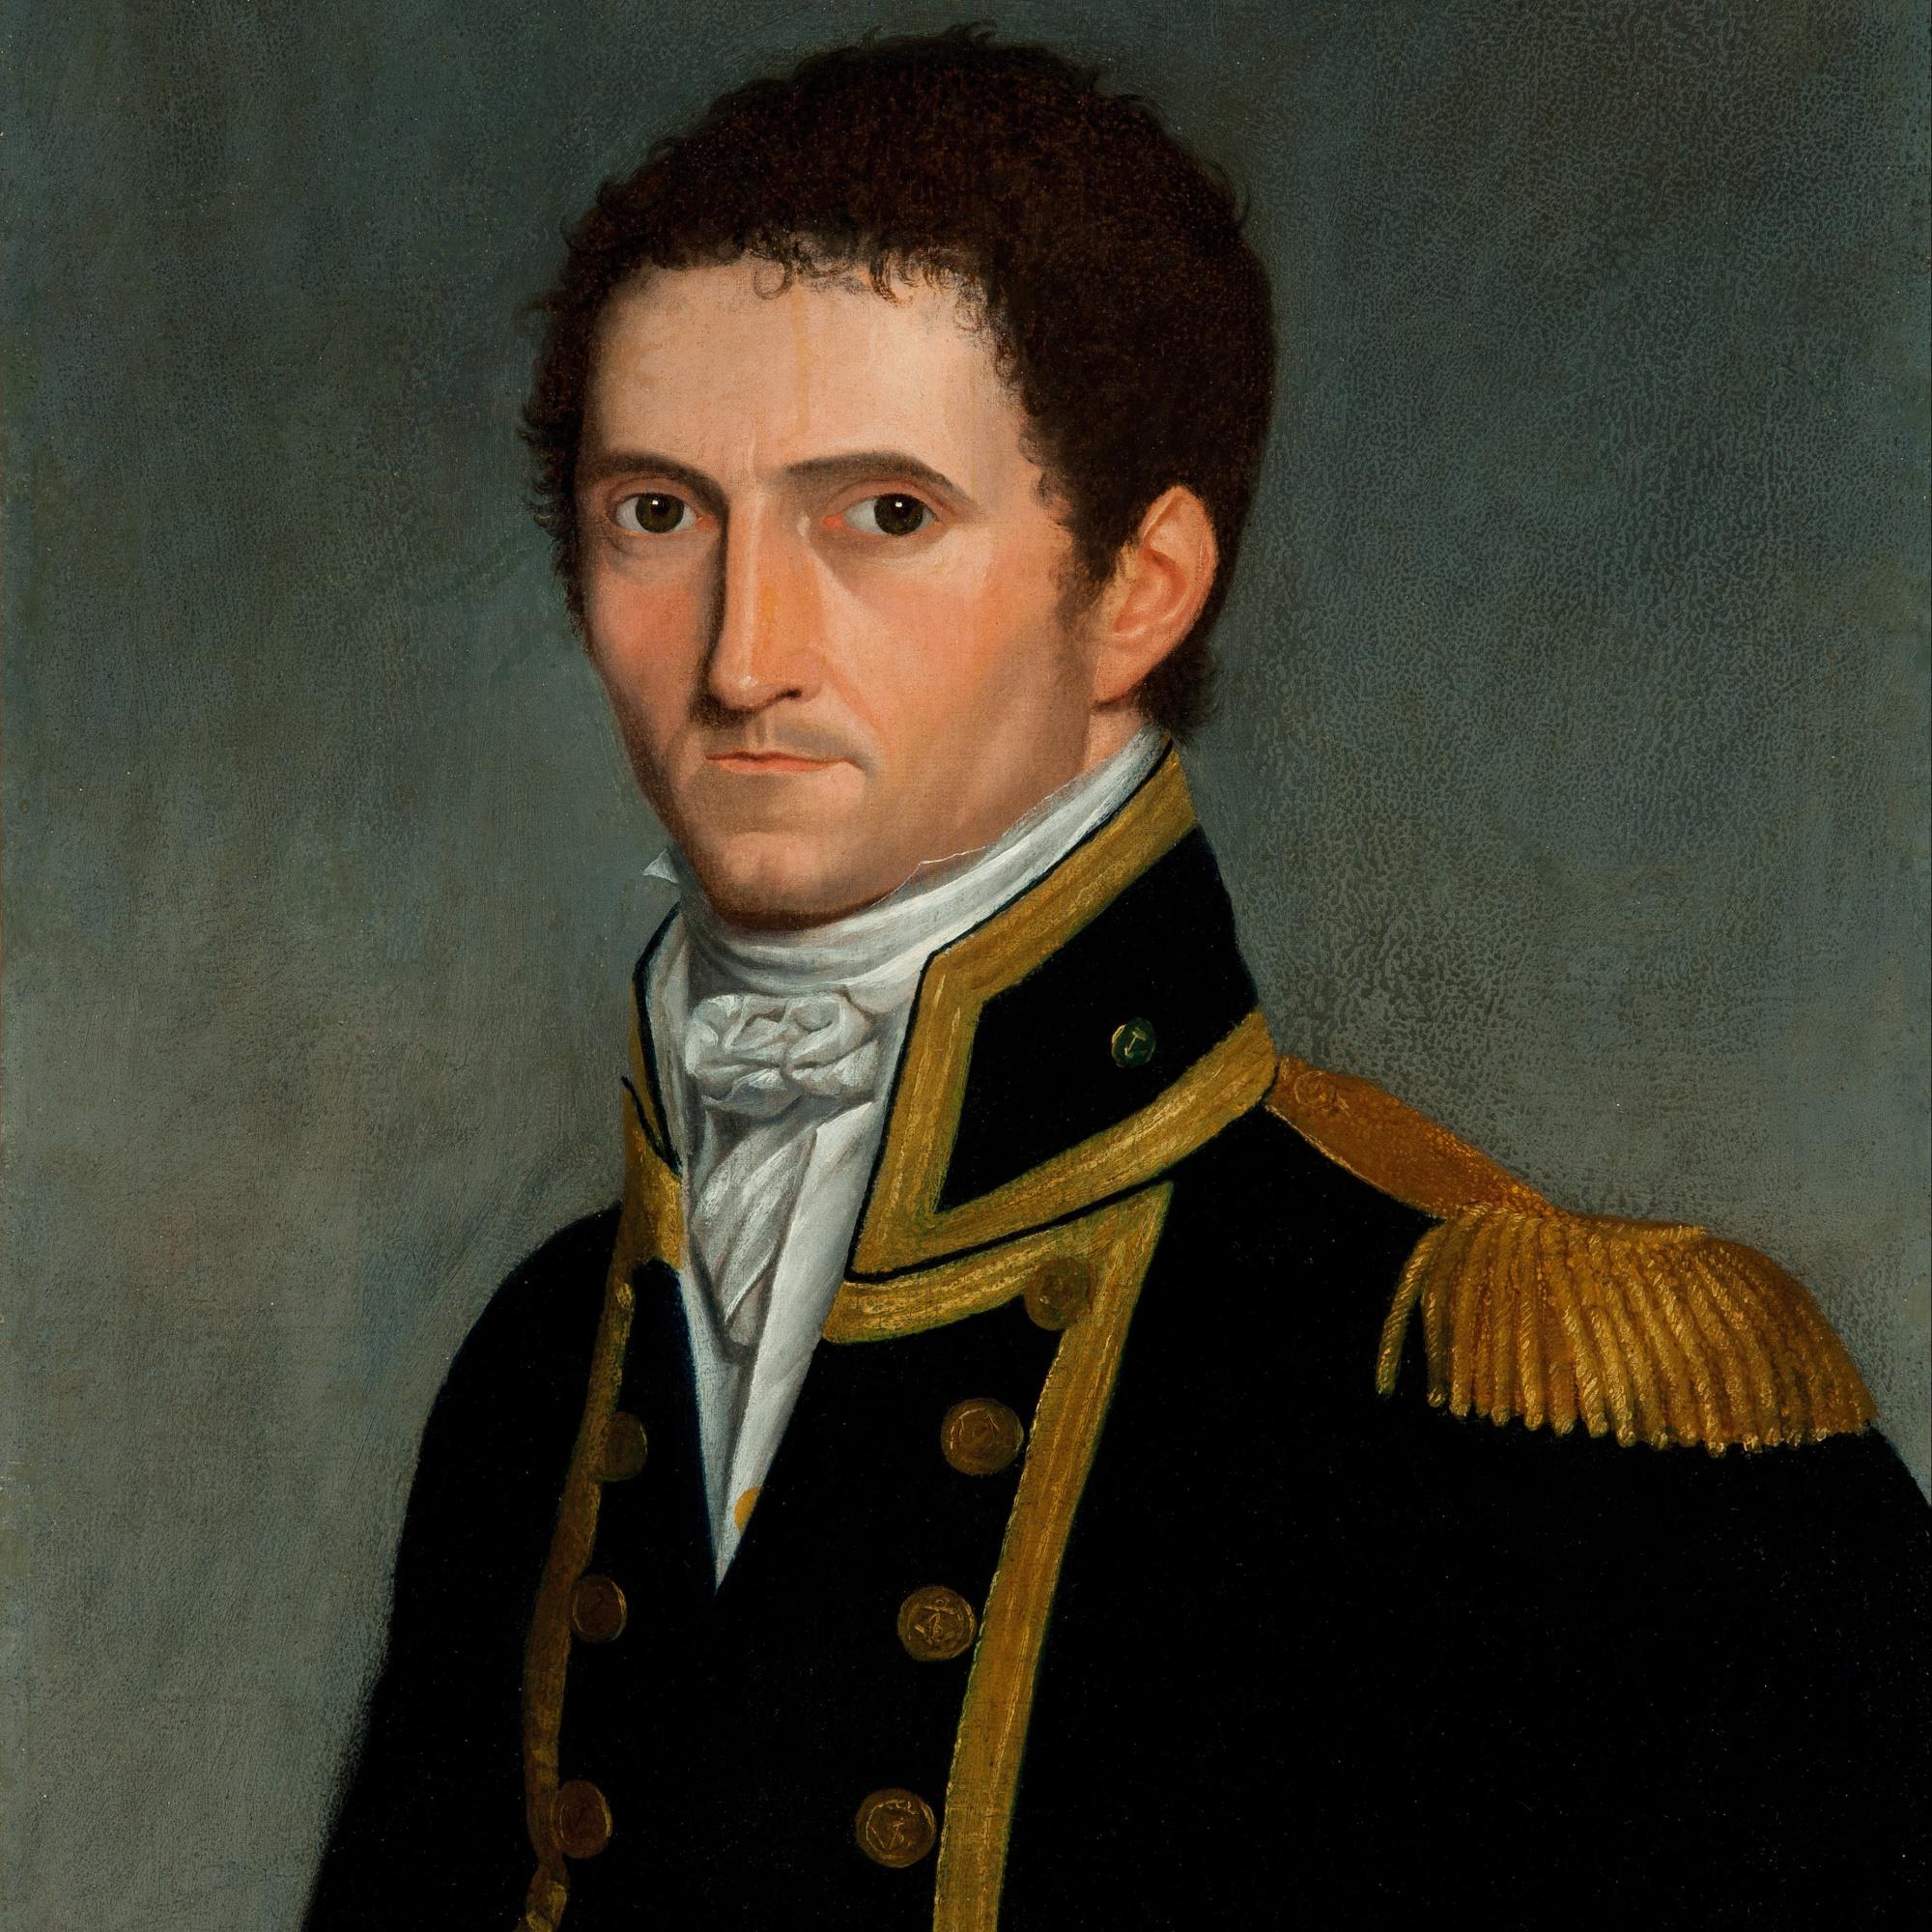 Antoine Toussaint de Chazal, Portrait of Captain Matthew Flinders, St. John's Cemetery Project, Old Parramattan, First Fleet, St. John's First Fleeters.